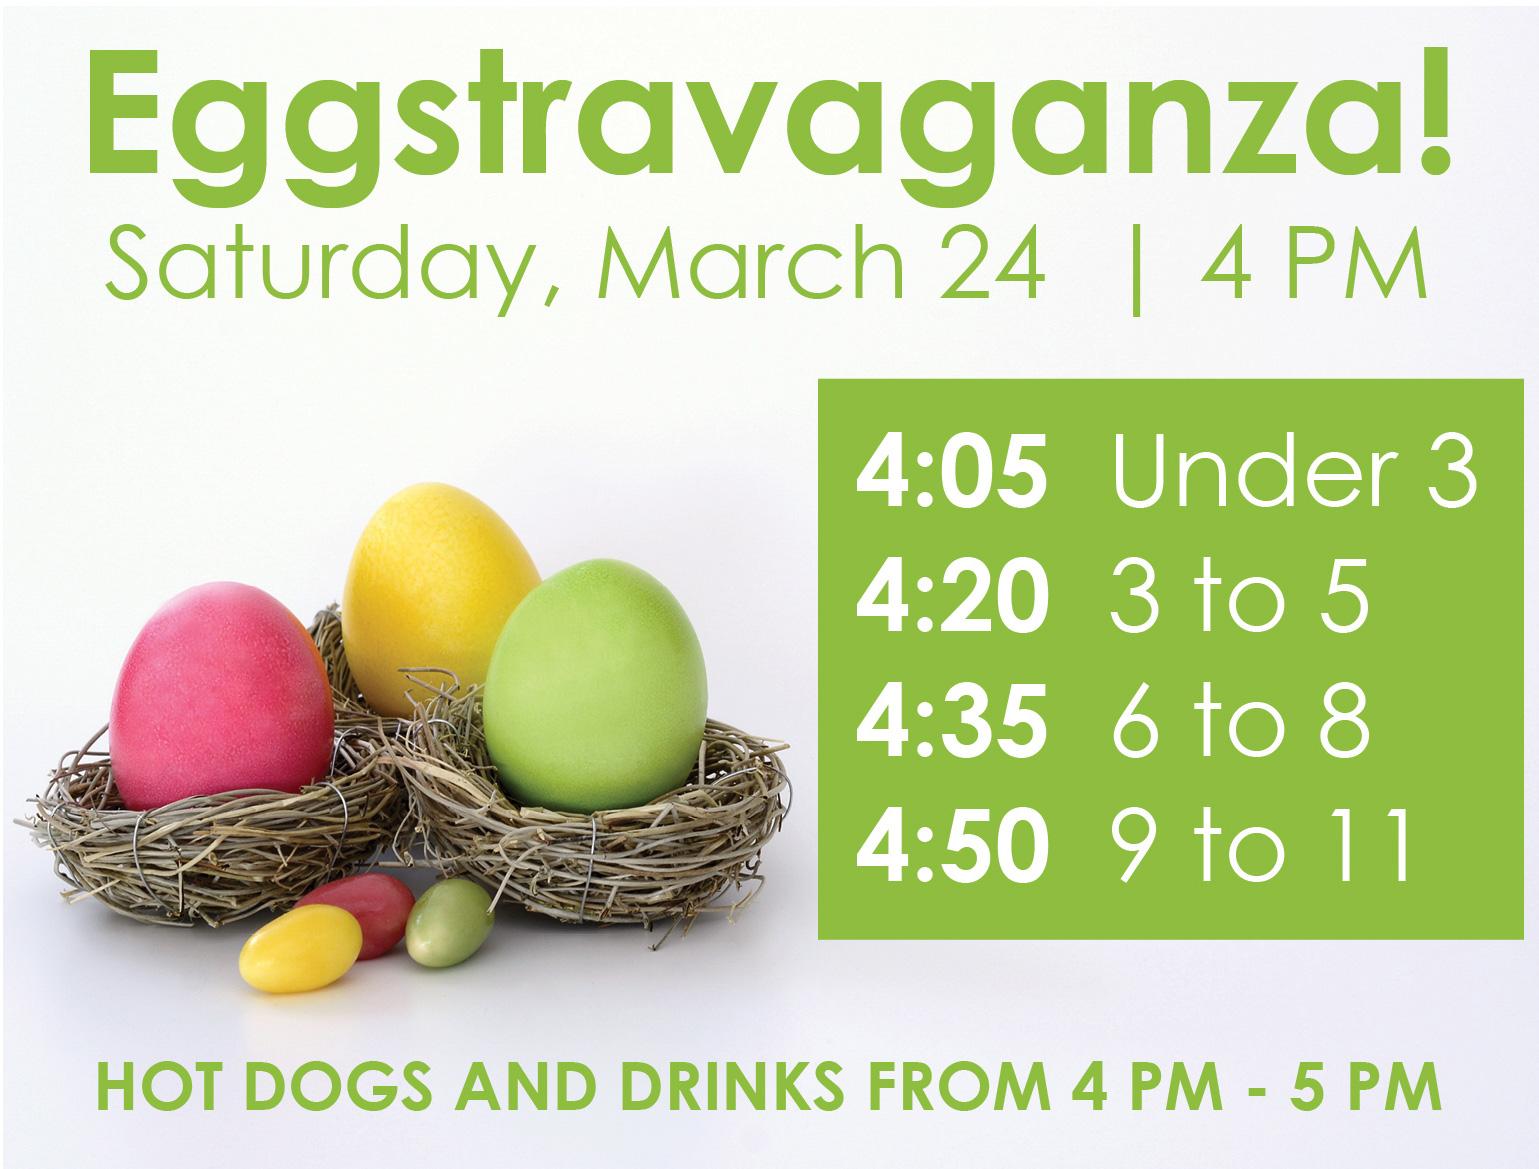 Easter eggstravaganza johns creek umc easter eggstravaganza negle Image collections